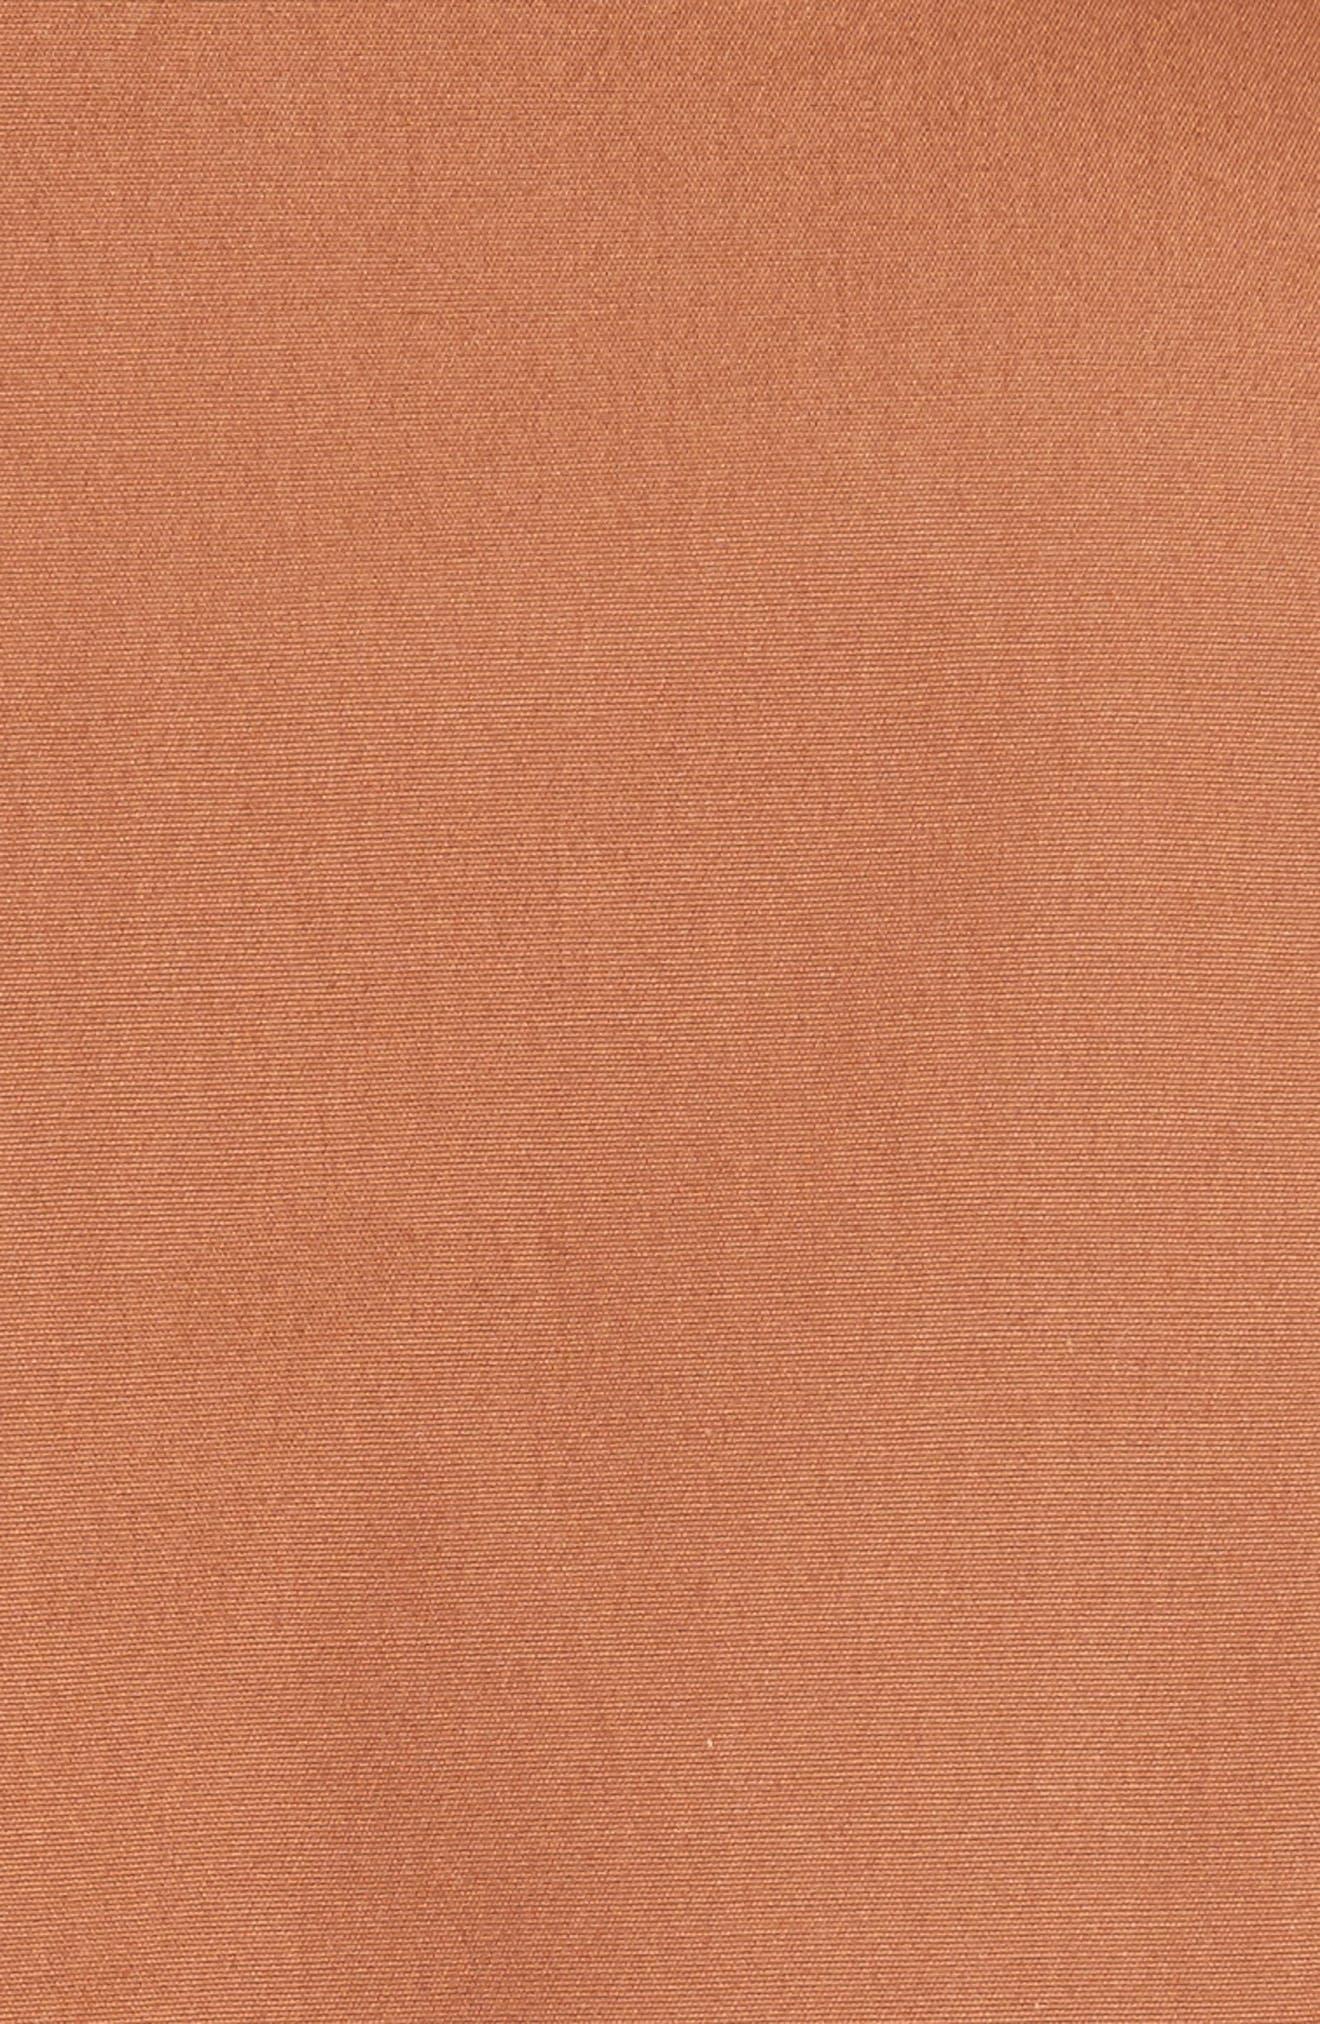 Truffaut Bell Sleeve Top,                             Alternate thumbnail 5, color,                             200